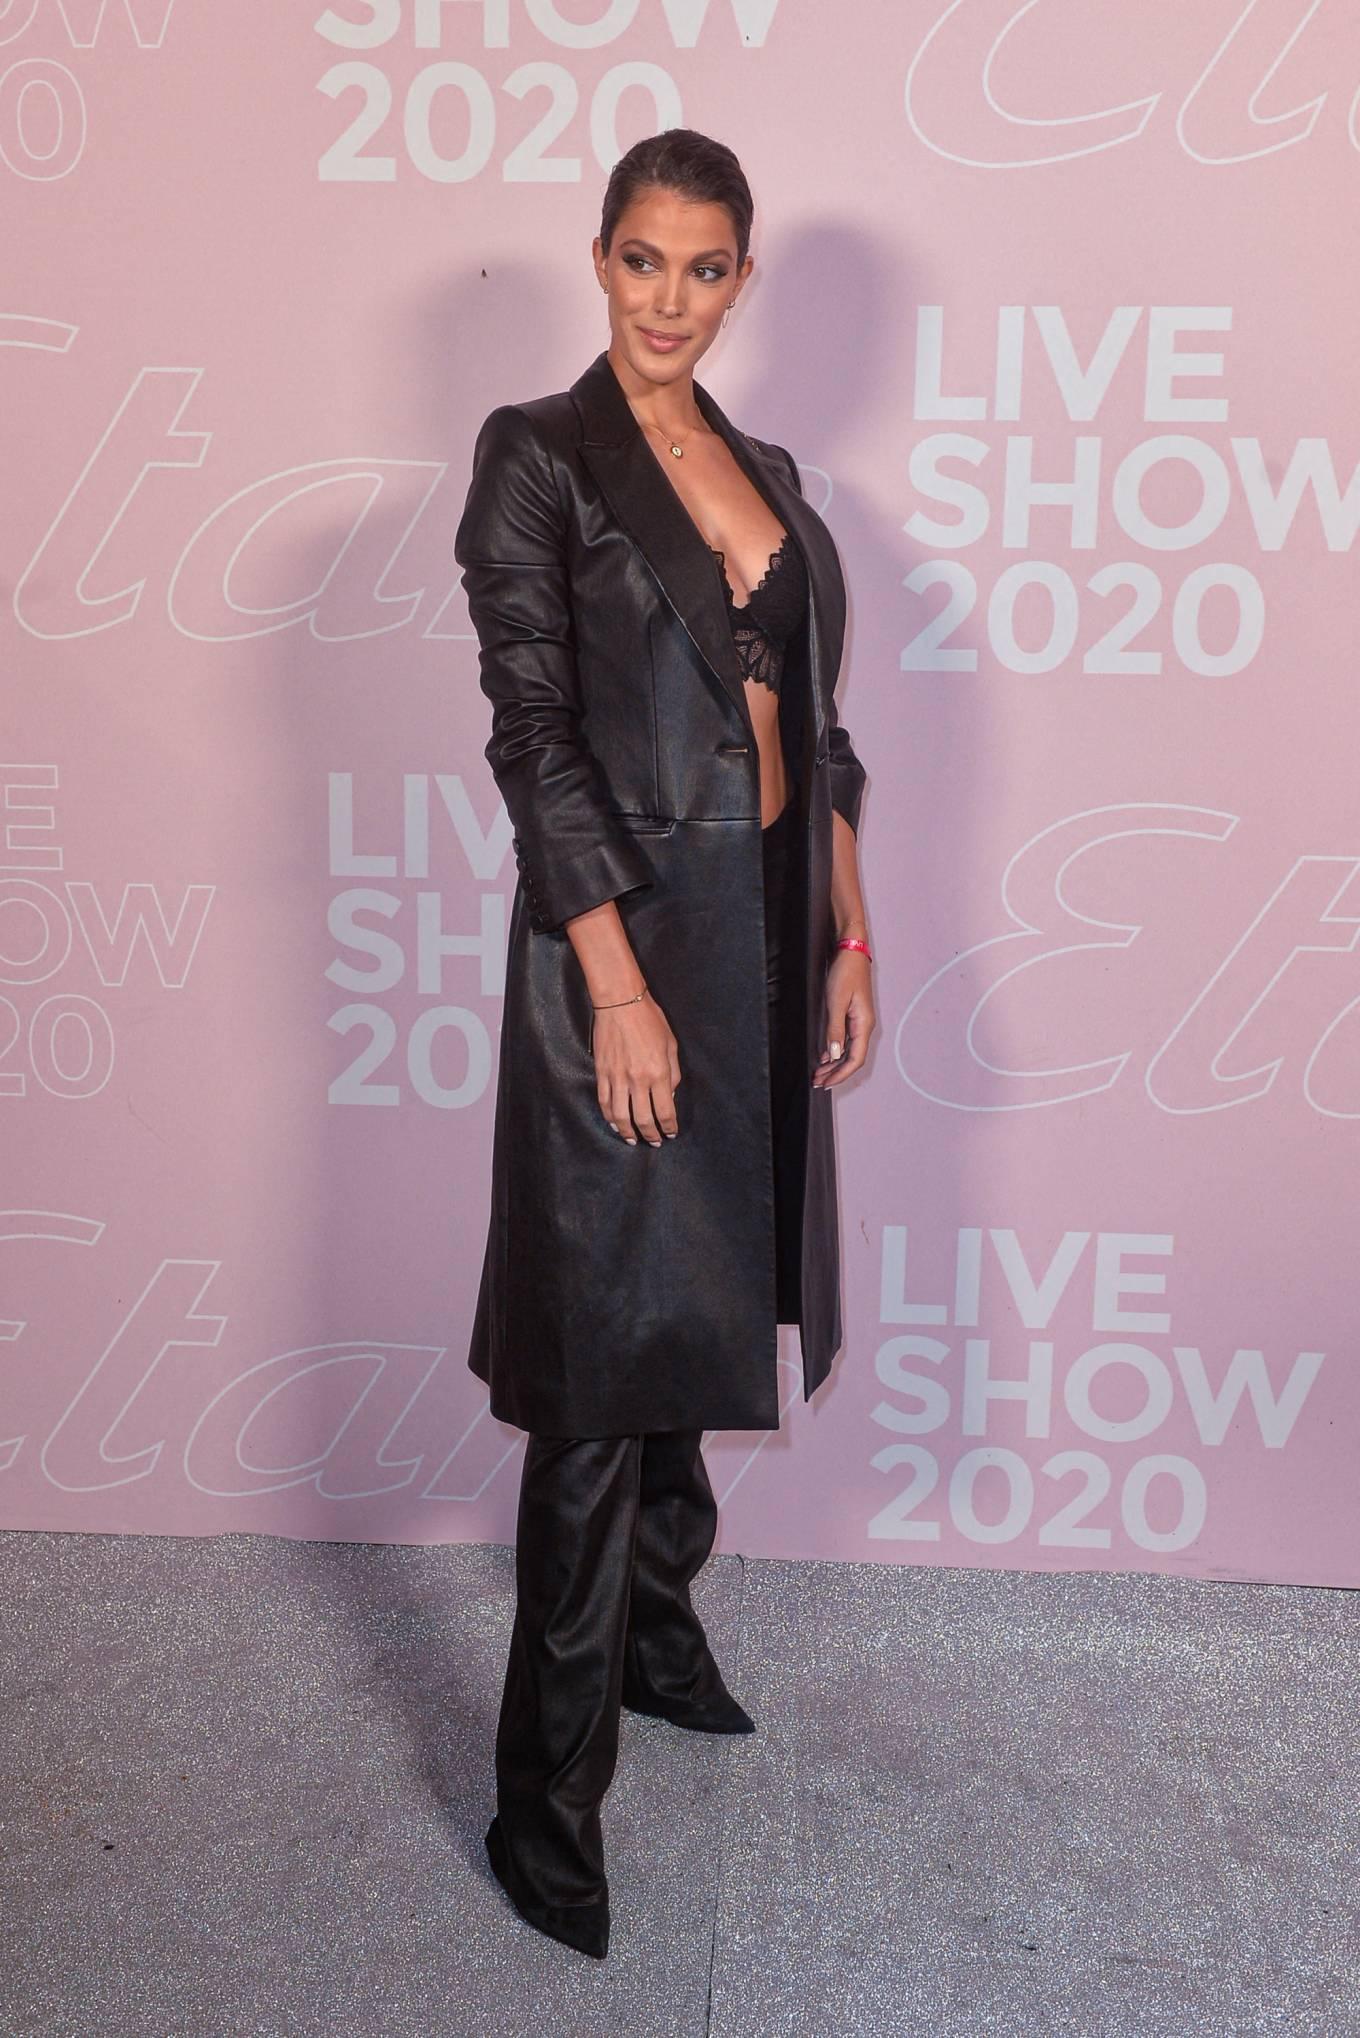 Iris Mittenaere Etam Show At Paris Fashion Week 2020 06 Gotceleb